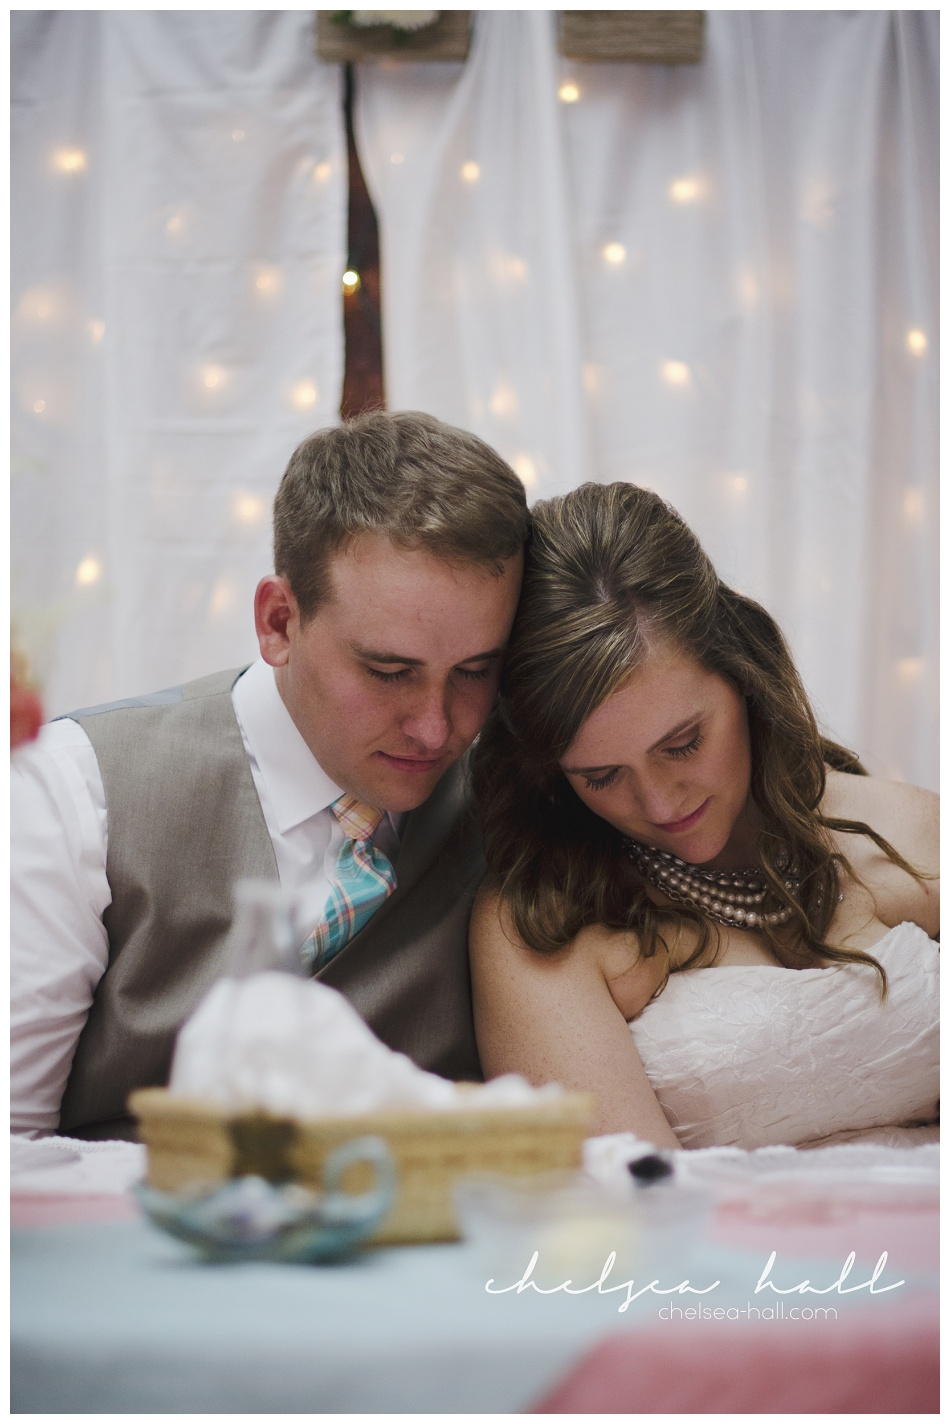 Chelsea Hall Photography, Dayton Wedding Photography, Kettering Wedding Photographer_0009